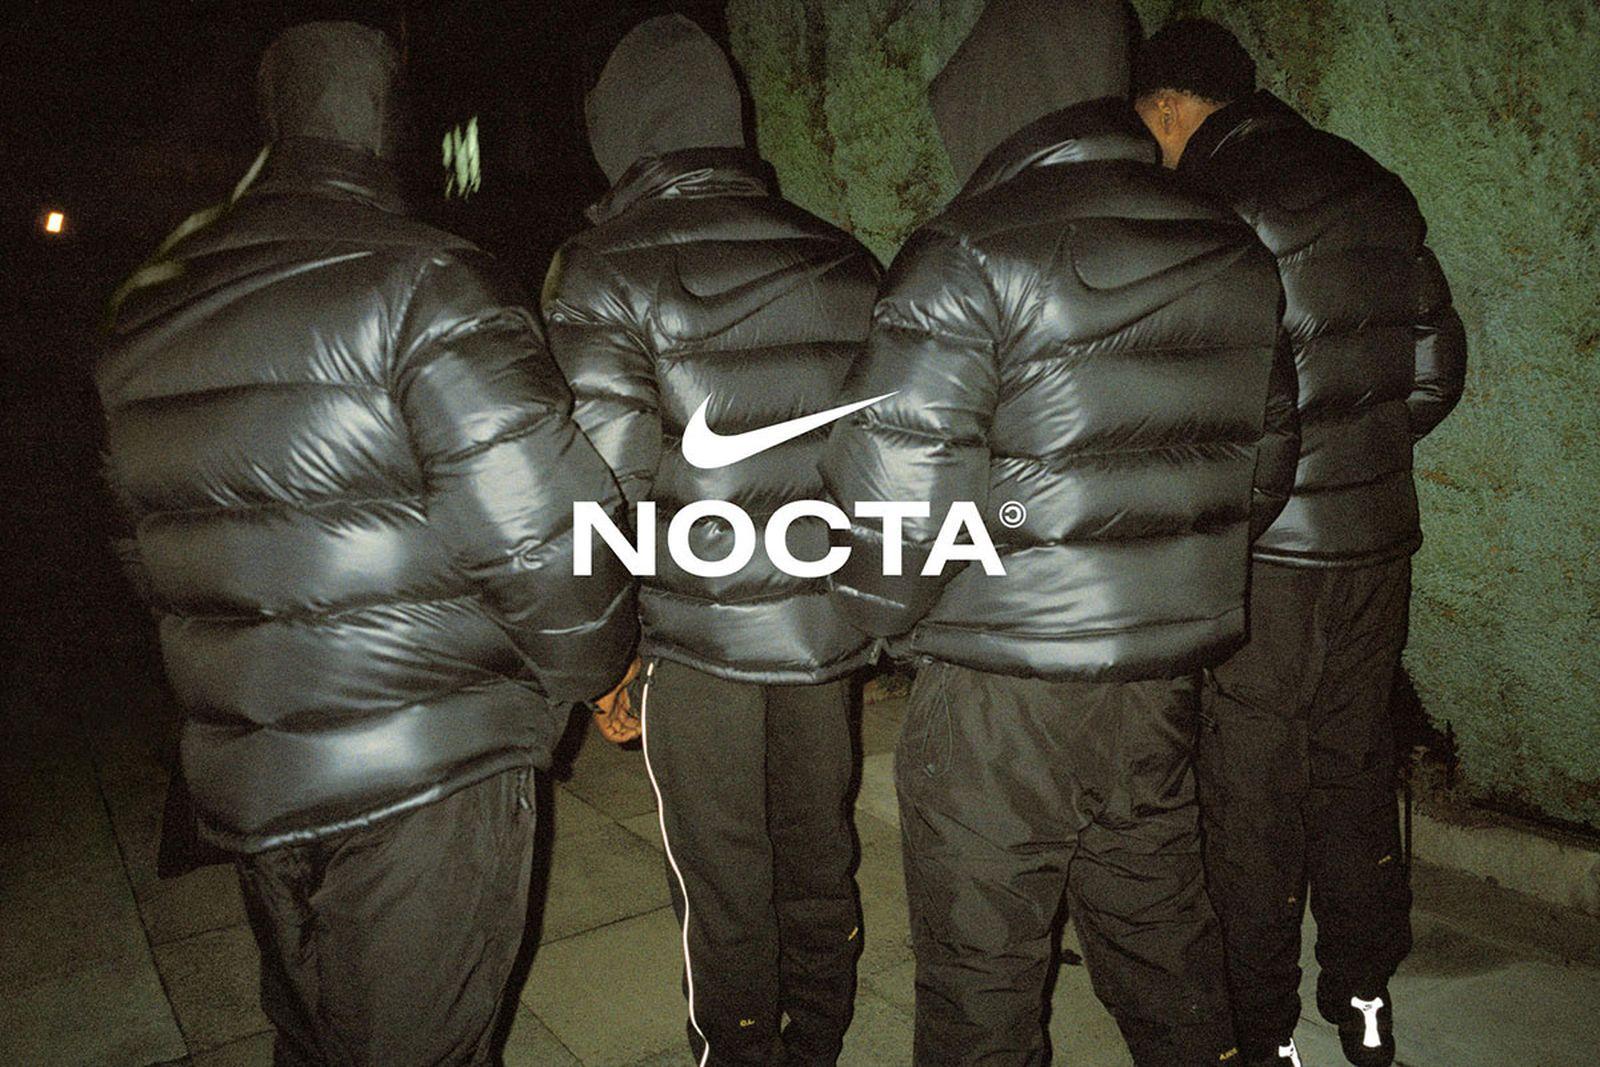 drake-nike-sub-label-nocta-02